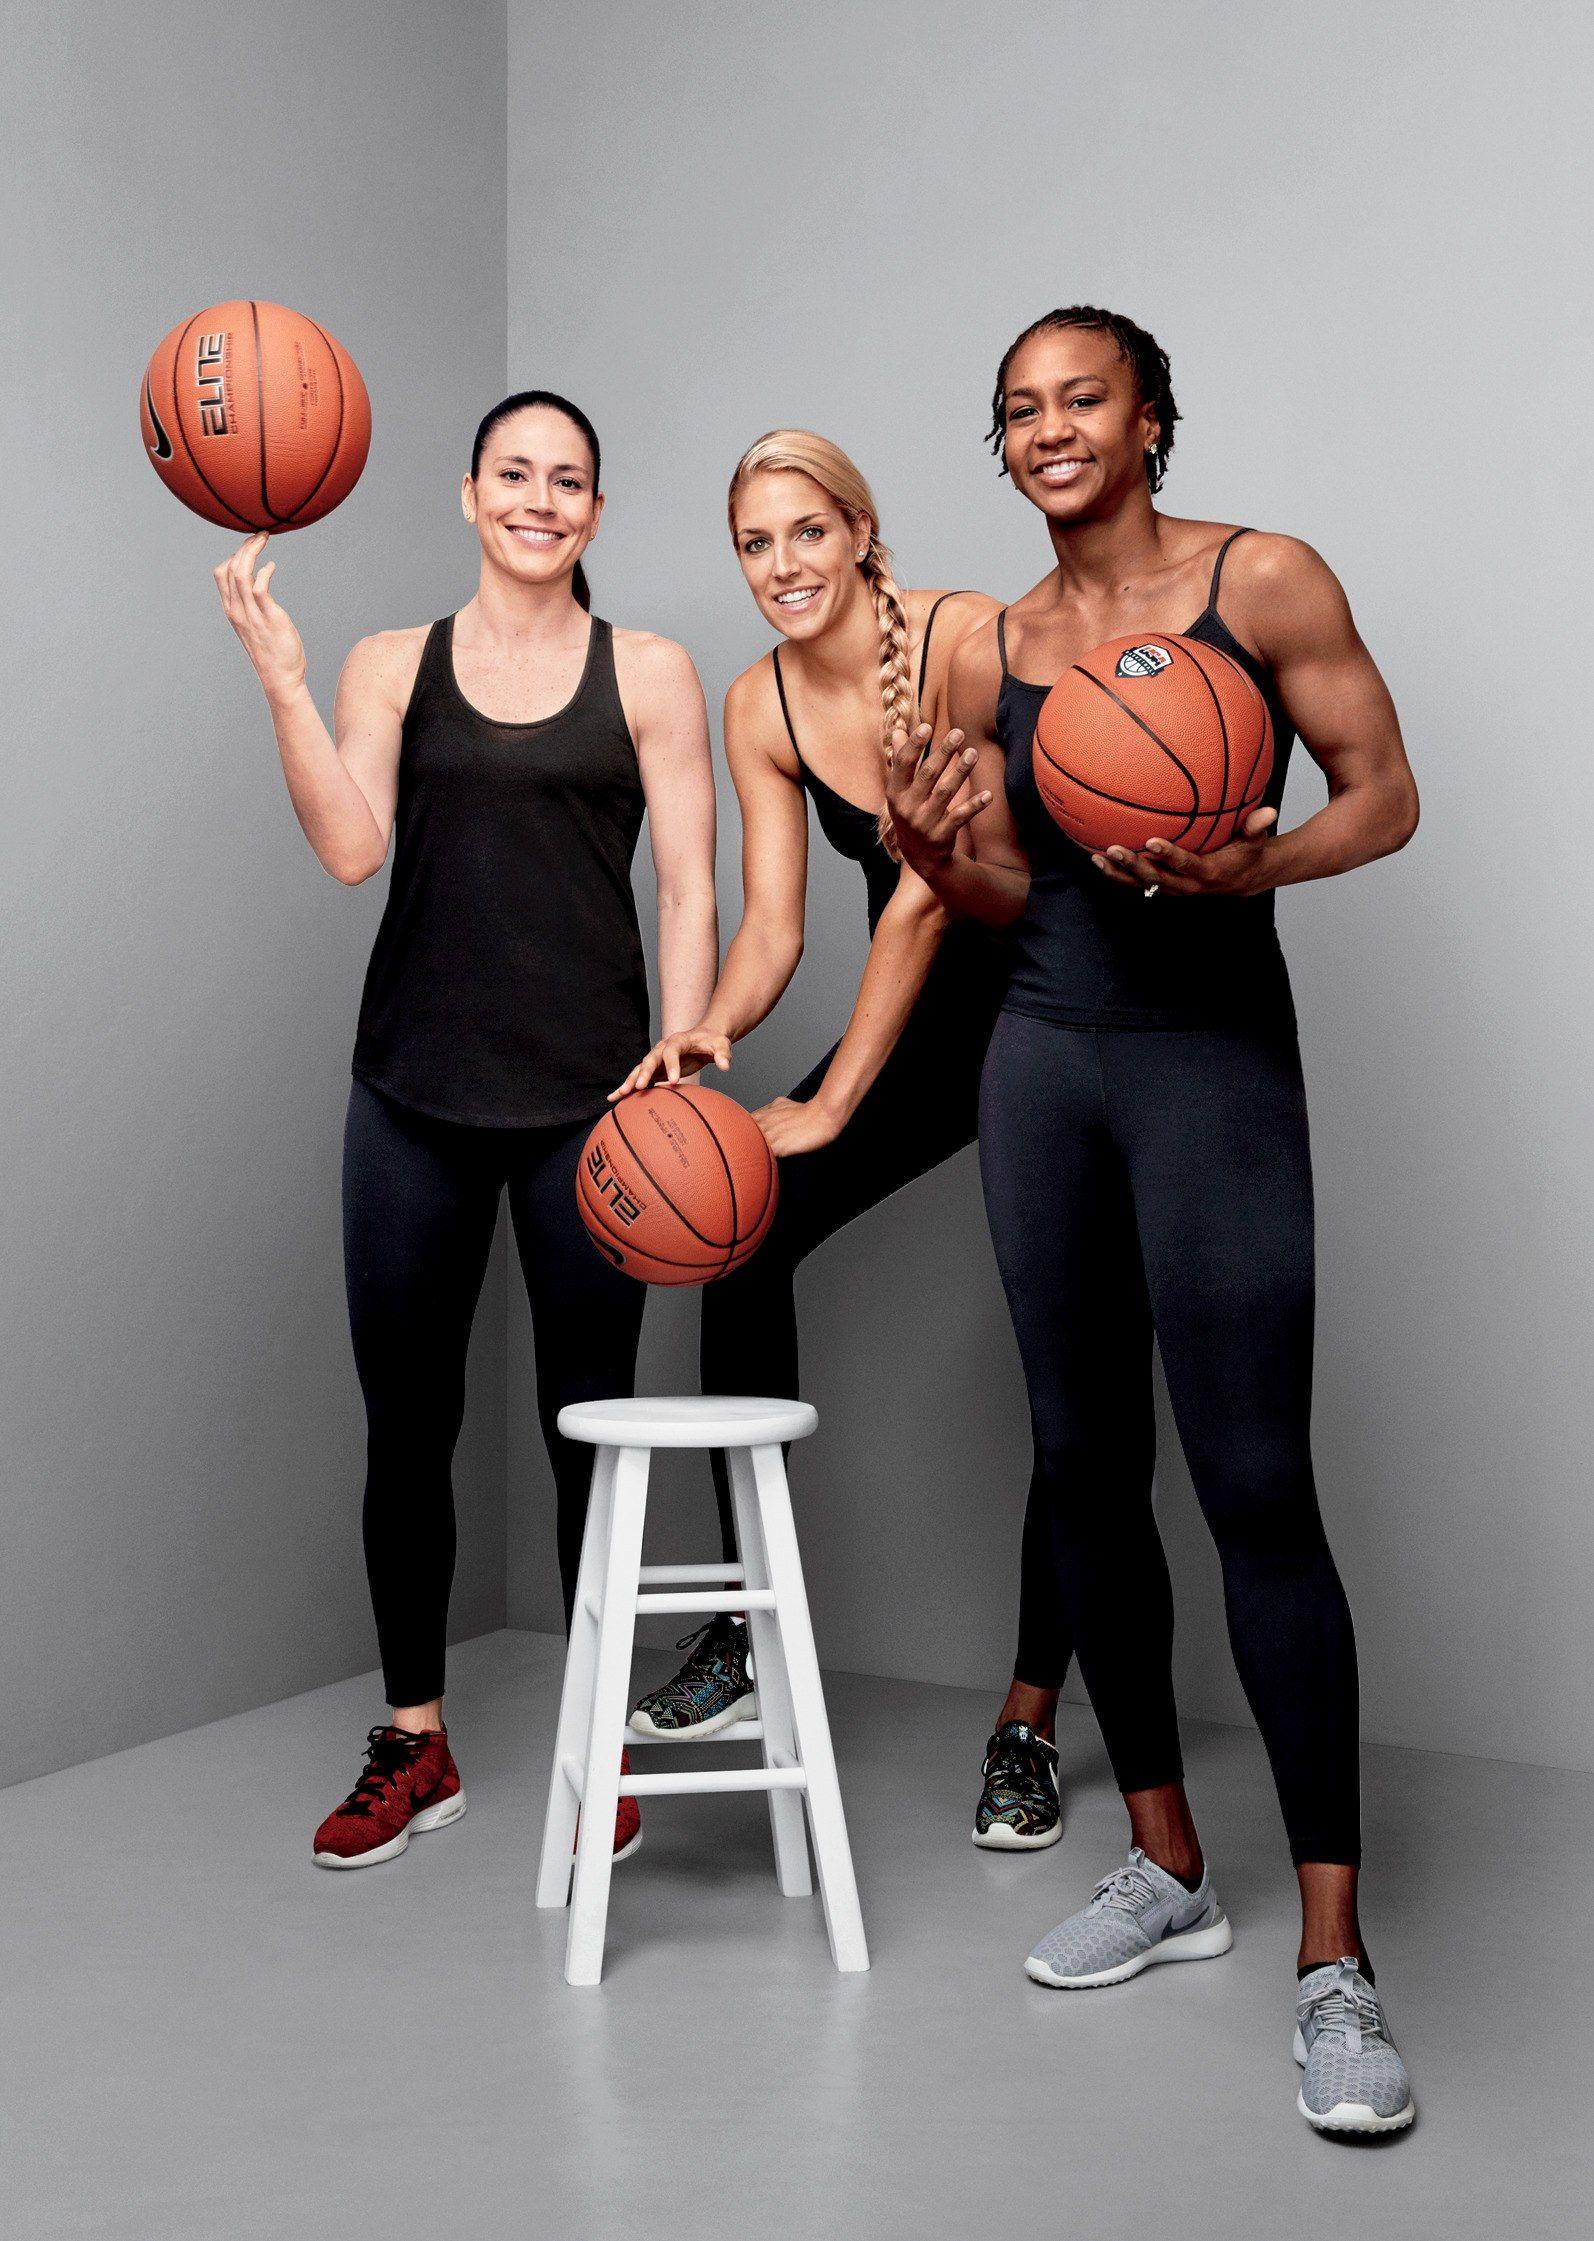 Team Usa Women S Basketball Plans To Dominate At The Olympics Womens Basketball Team Usa Basketball Basketball Girls